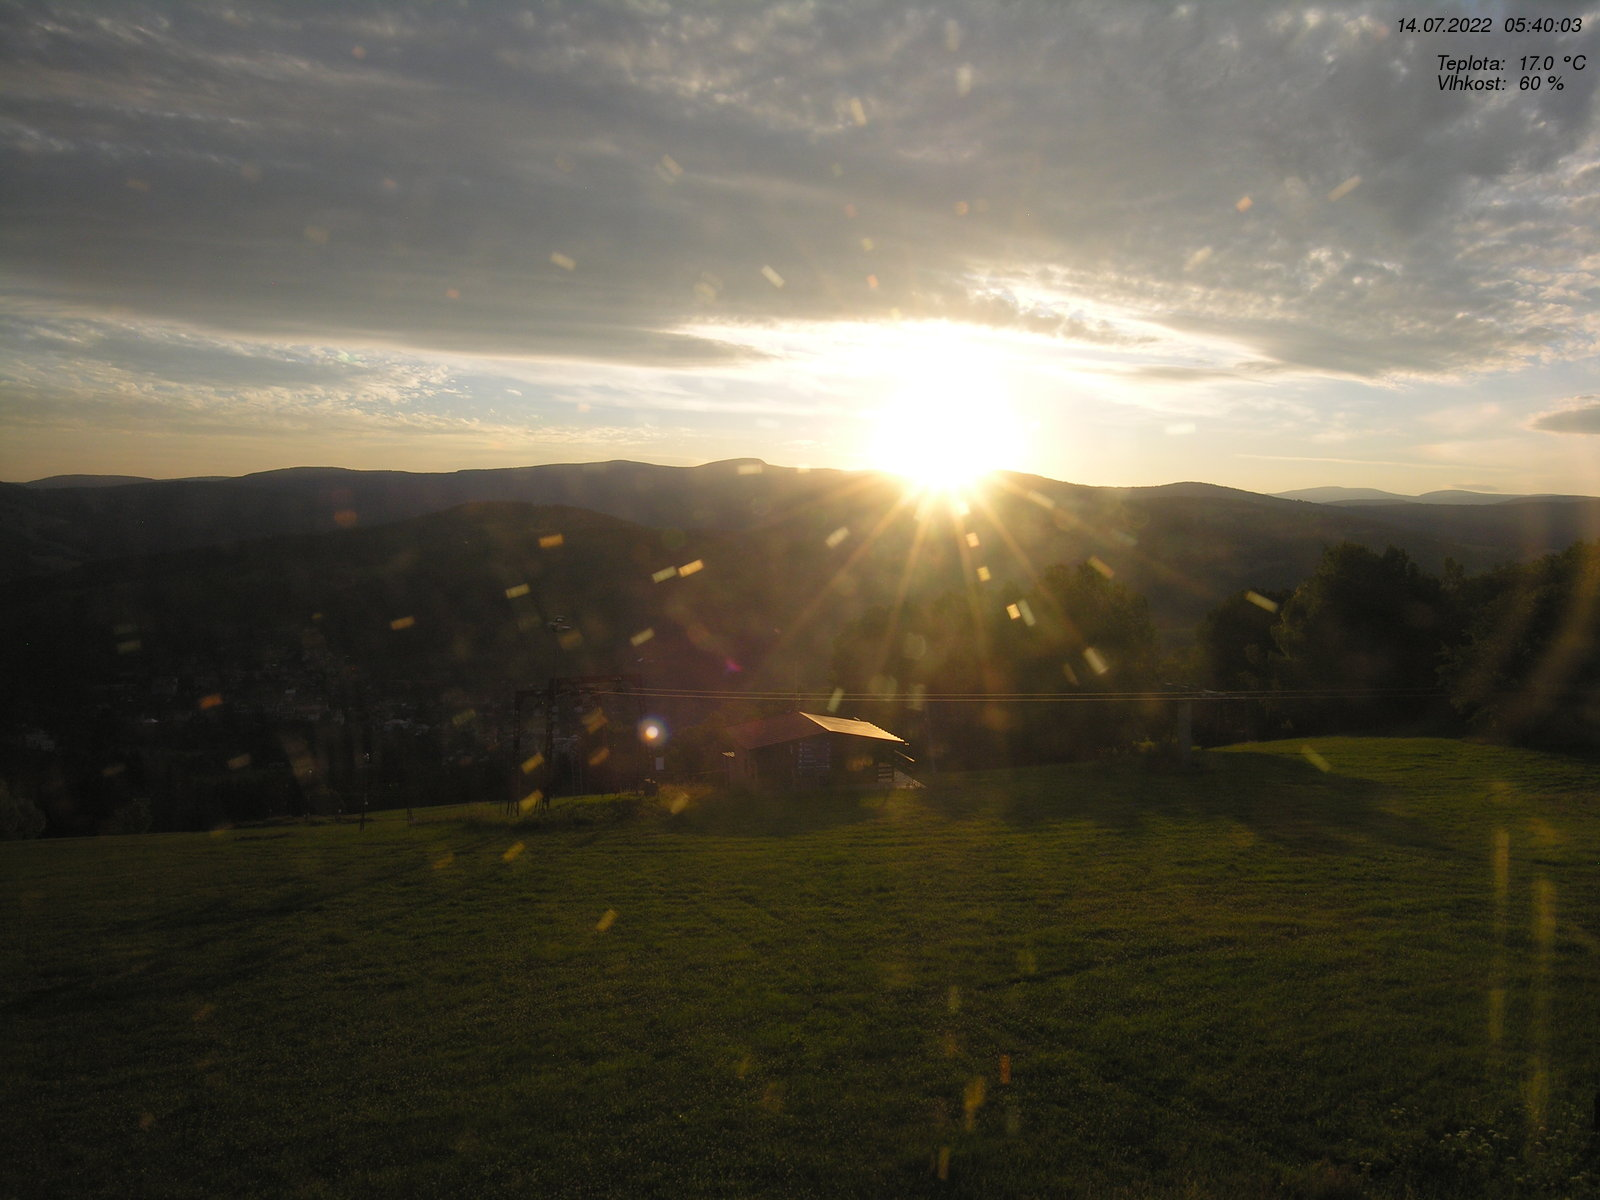 Webcam Ski Resort Rokytnice n. Jizerou Blick auf Lysa Hora & Kotel - Giant Mountains